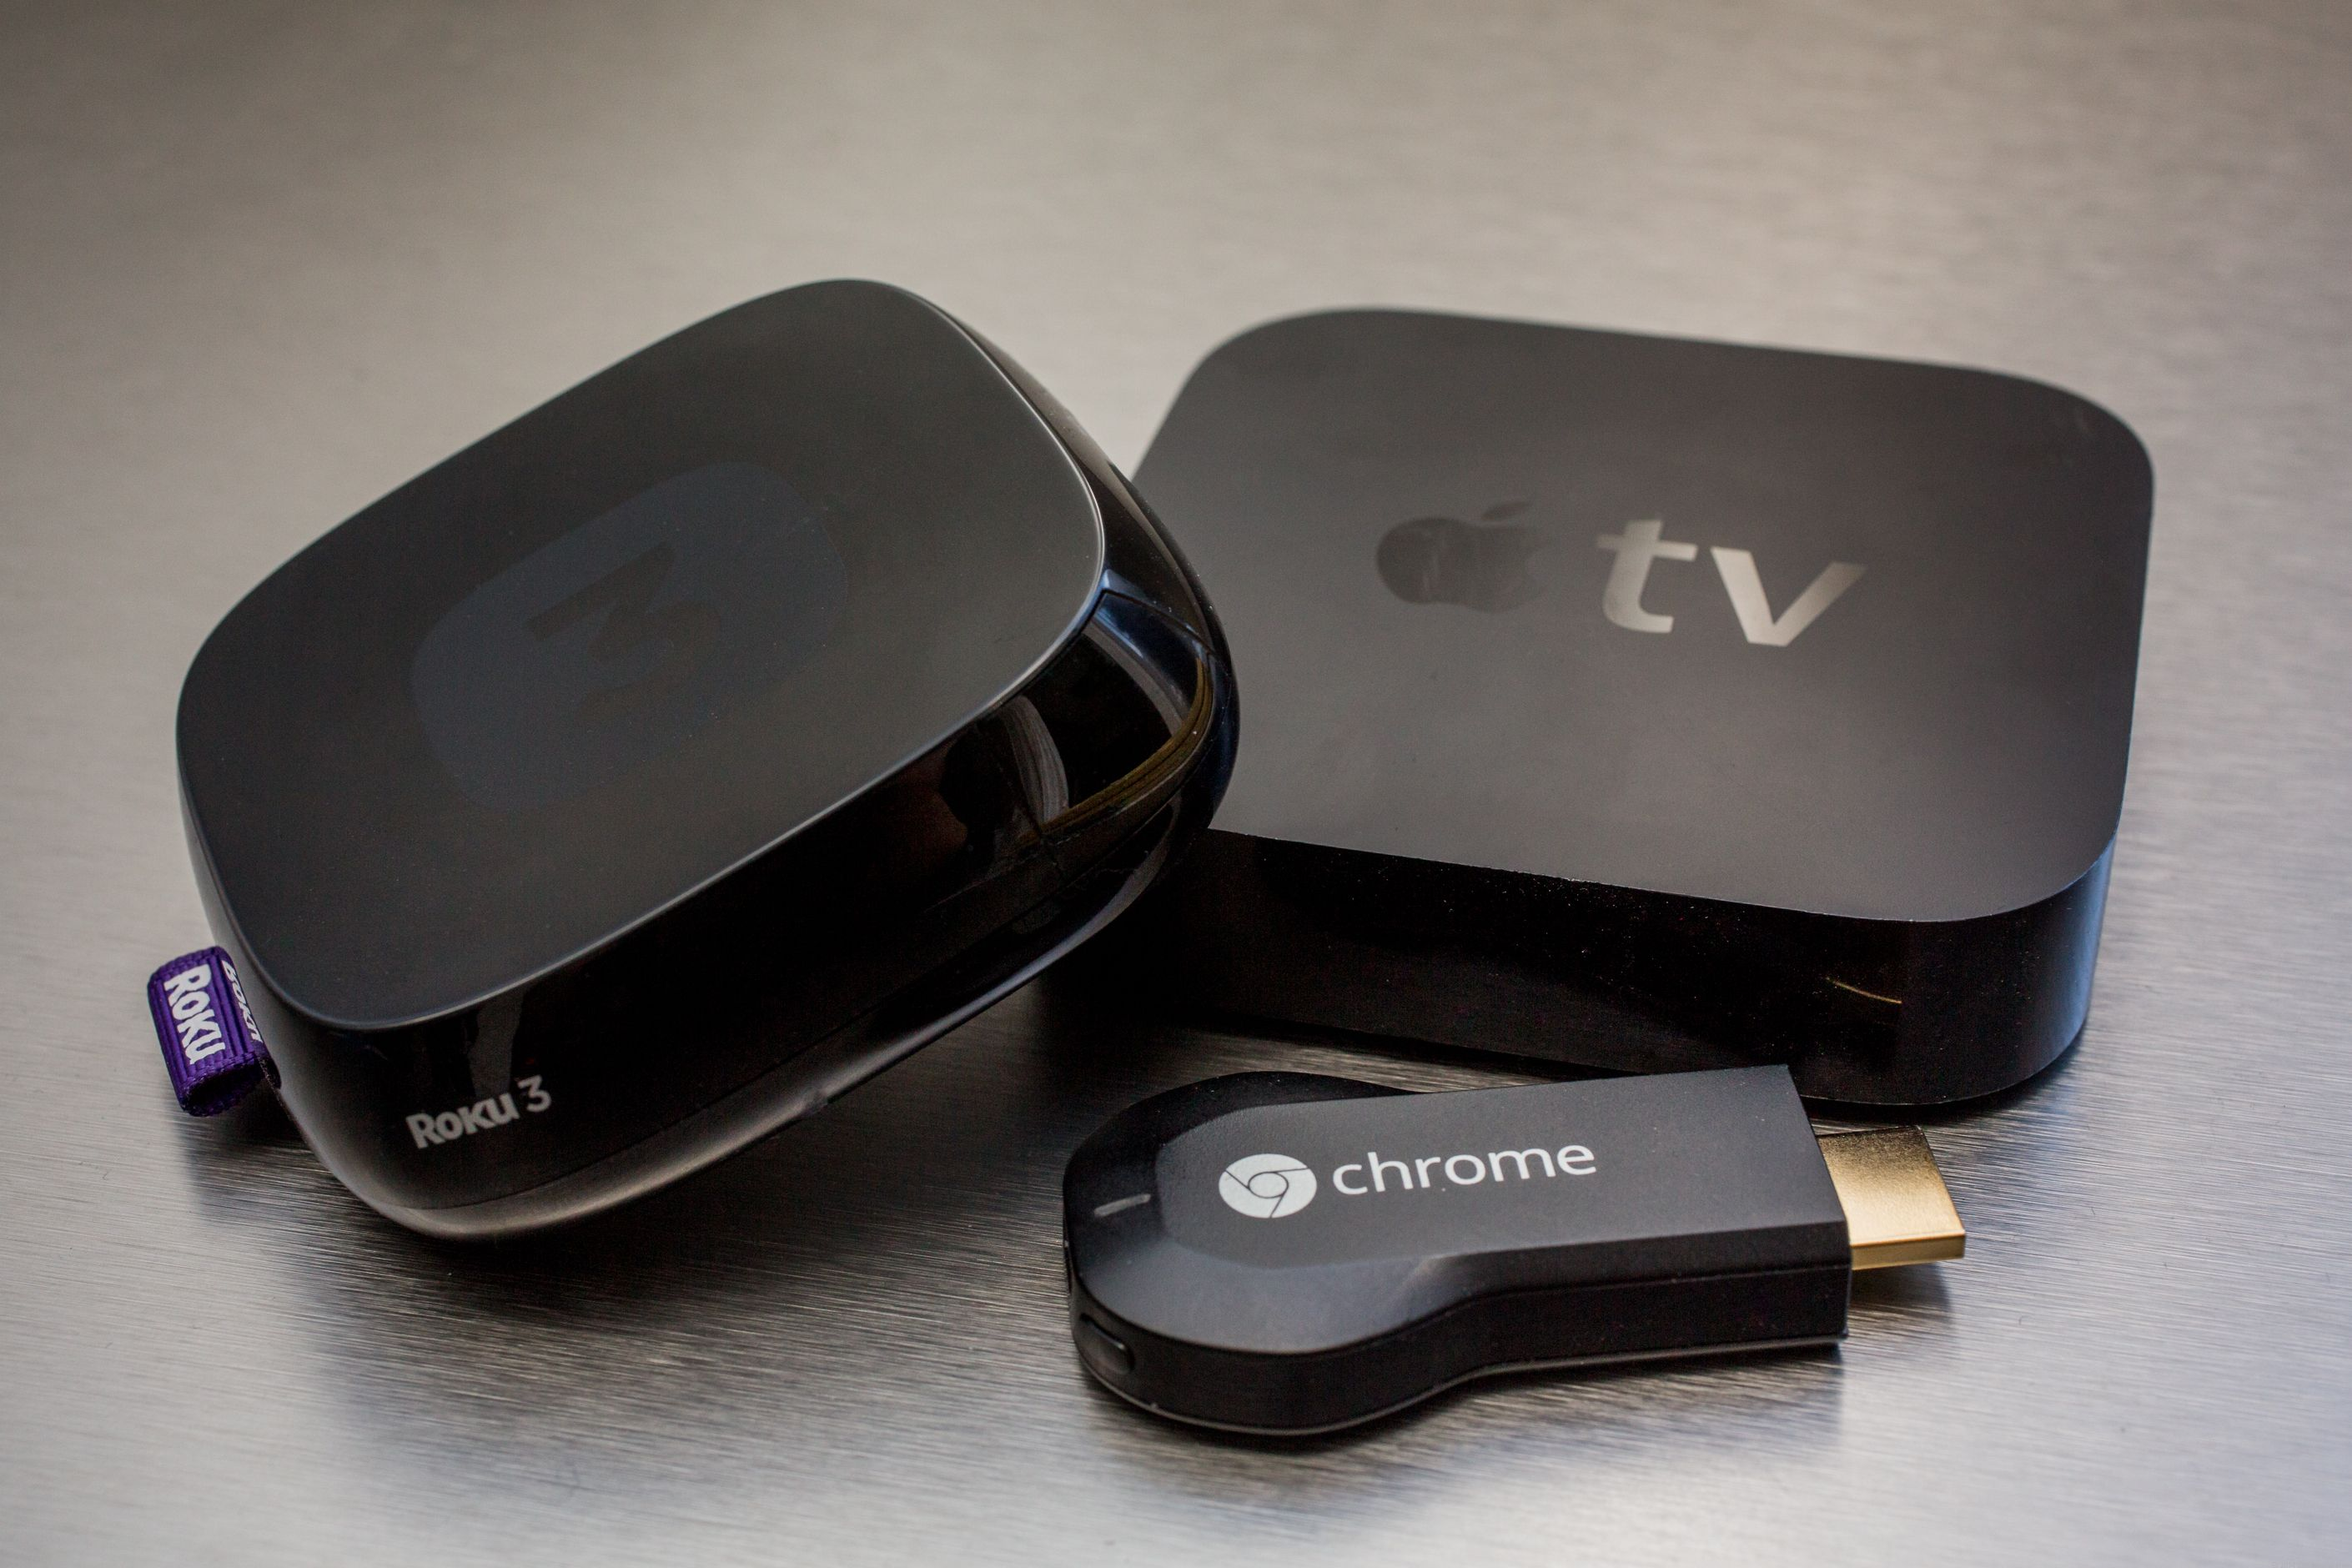 Roku vs. Apple TV vs. Chromecast vs. Amazon Fire TV vs